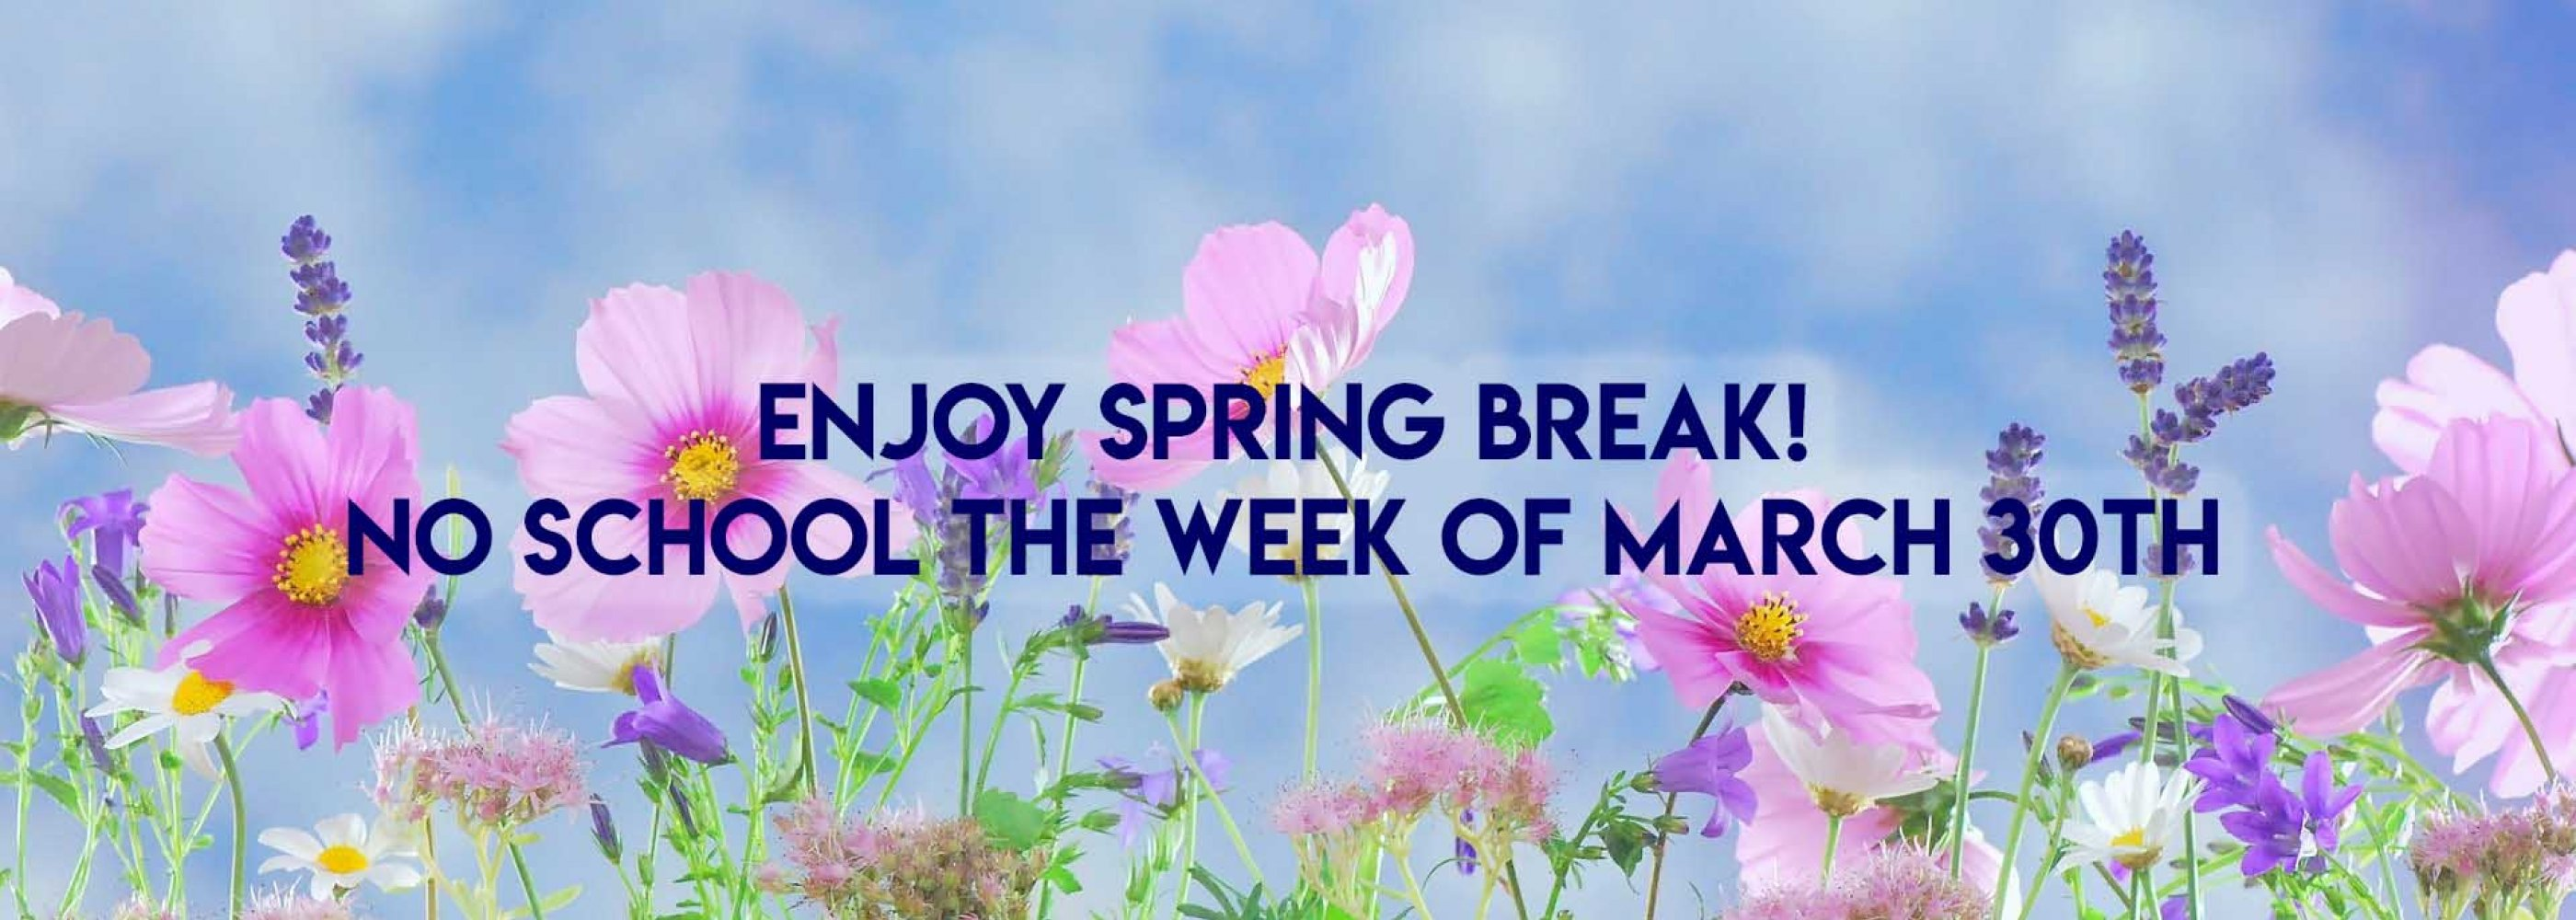 SPRING BREAK NO SCHOOL WEEK OF MARCH 30